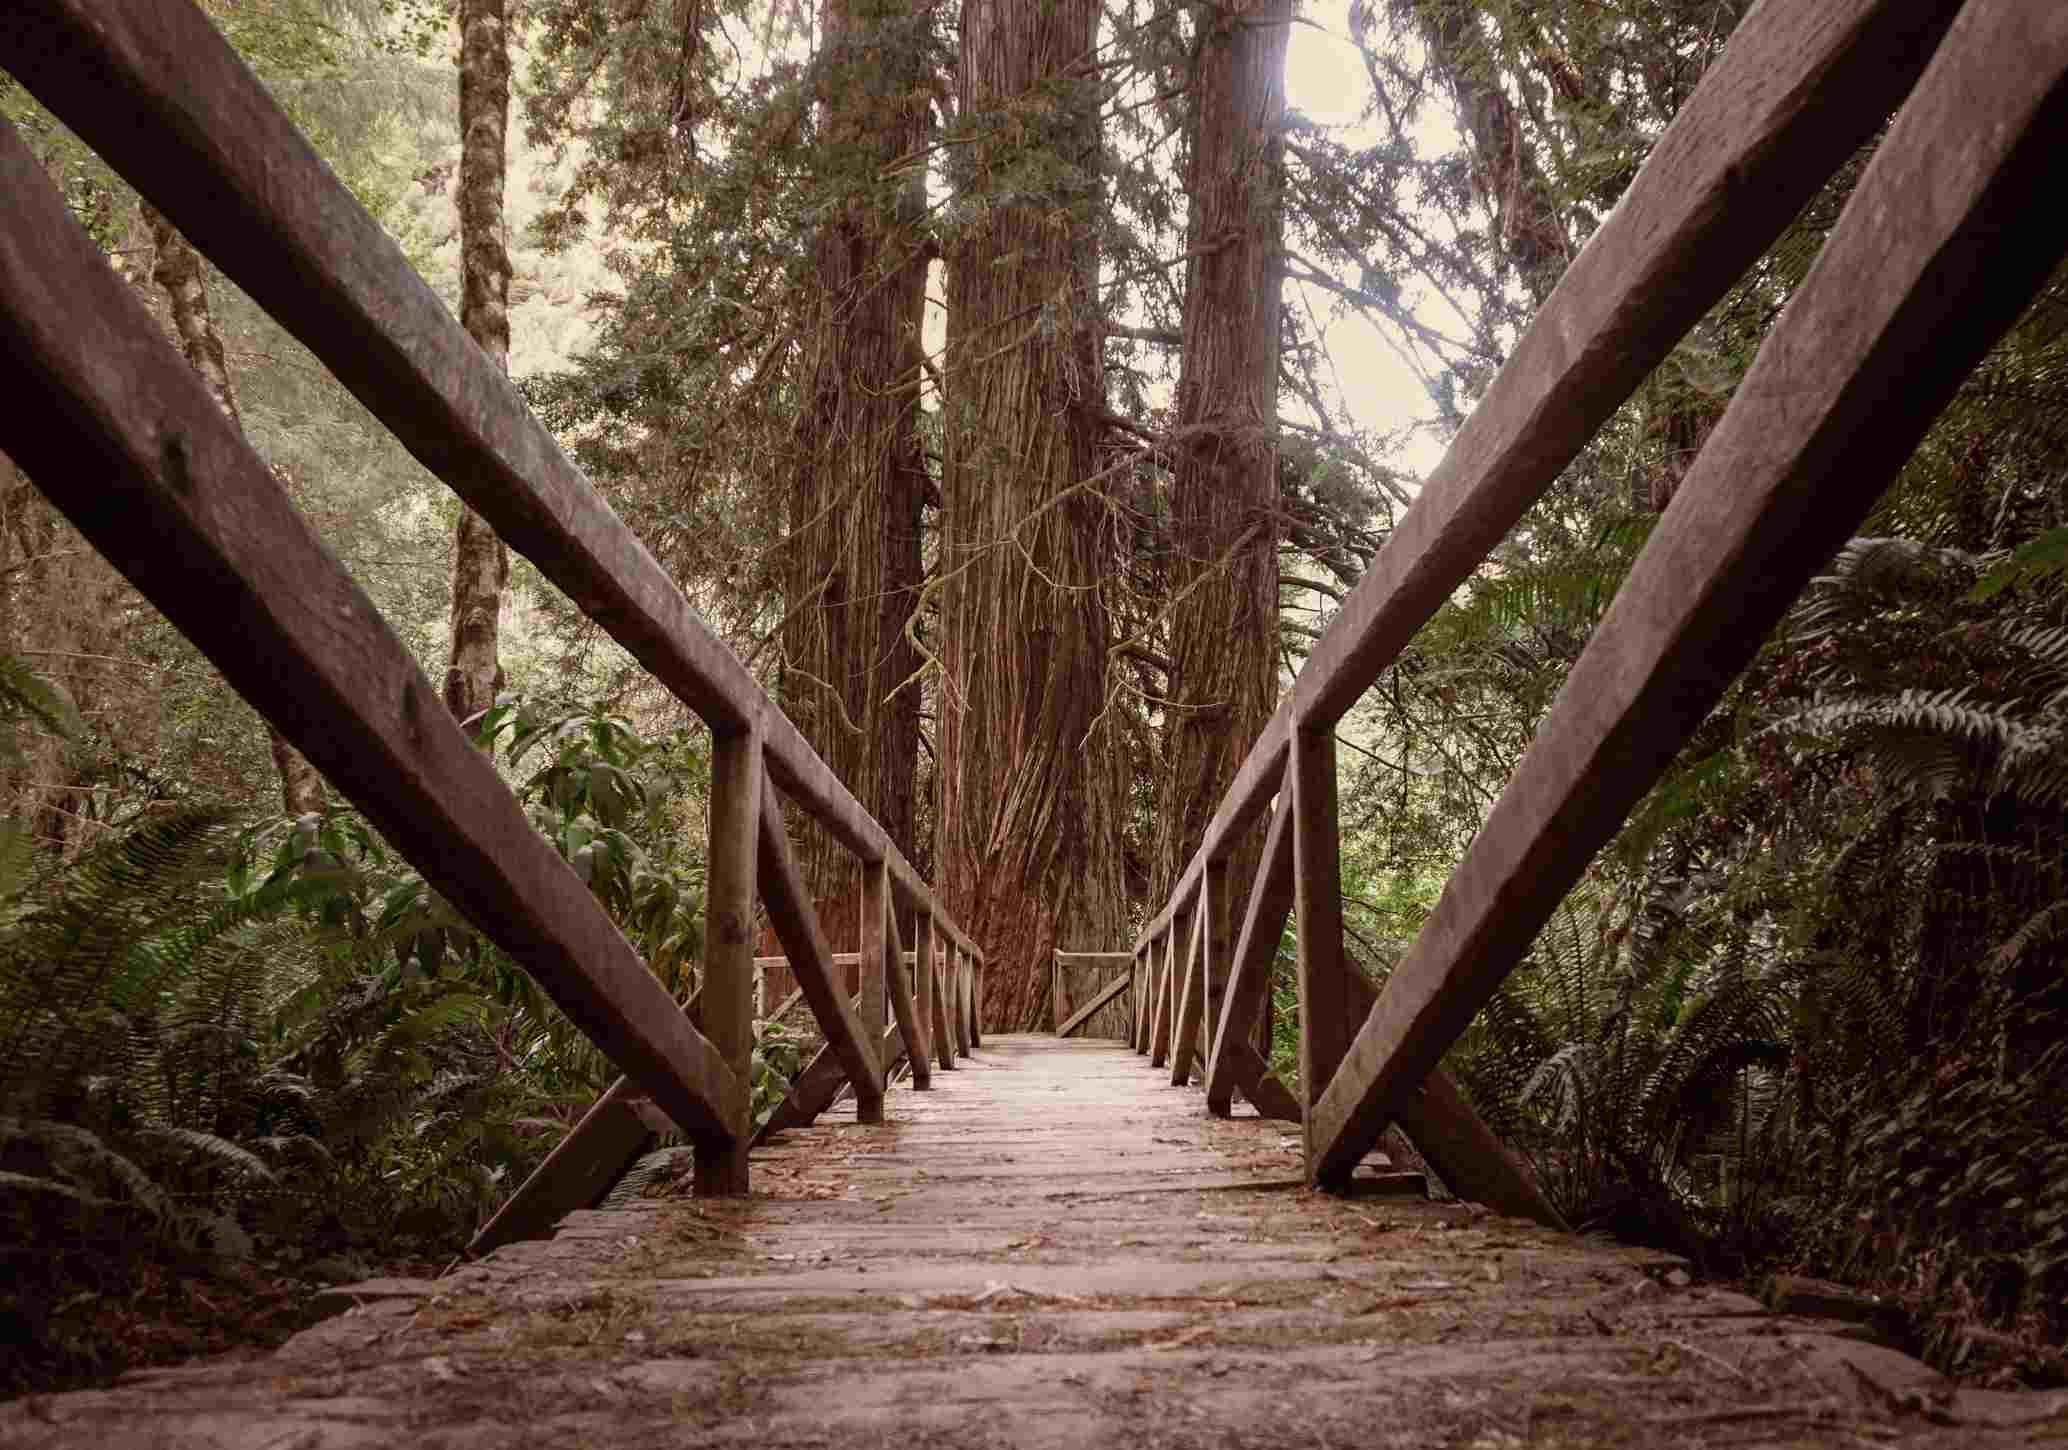 Prairie Creek Redwoods State Park, Orick